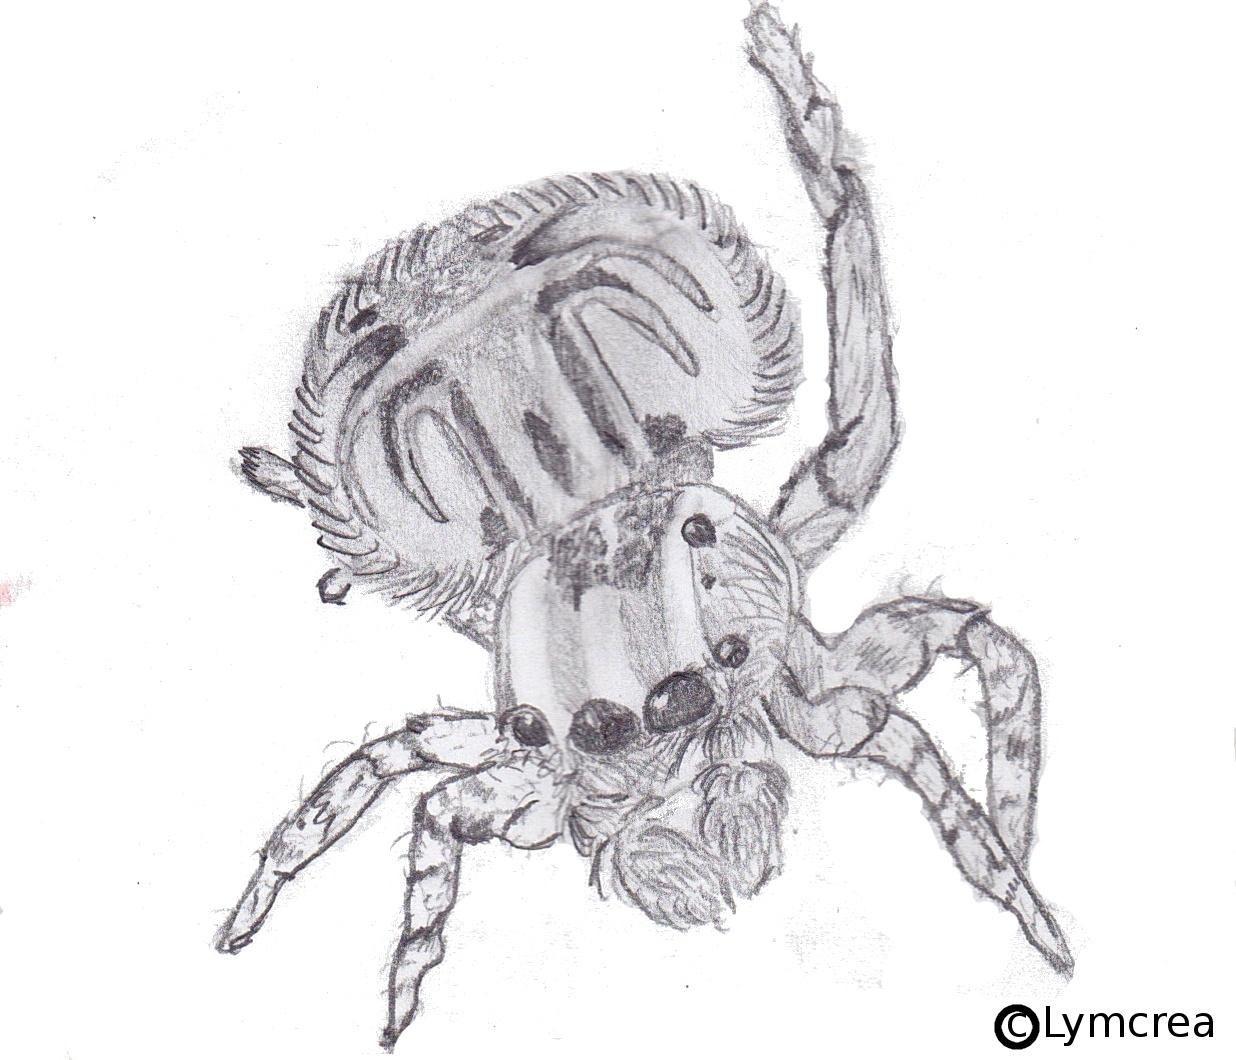 Spider - Lymcrea intérieur Dessiner Une Araignee